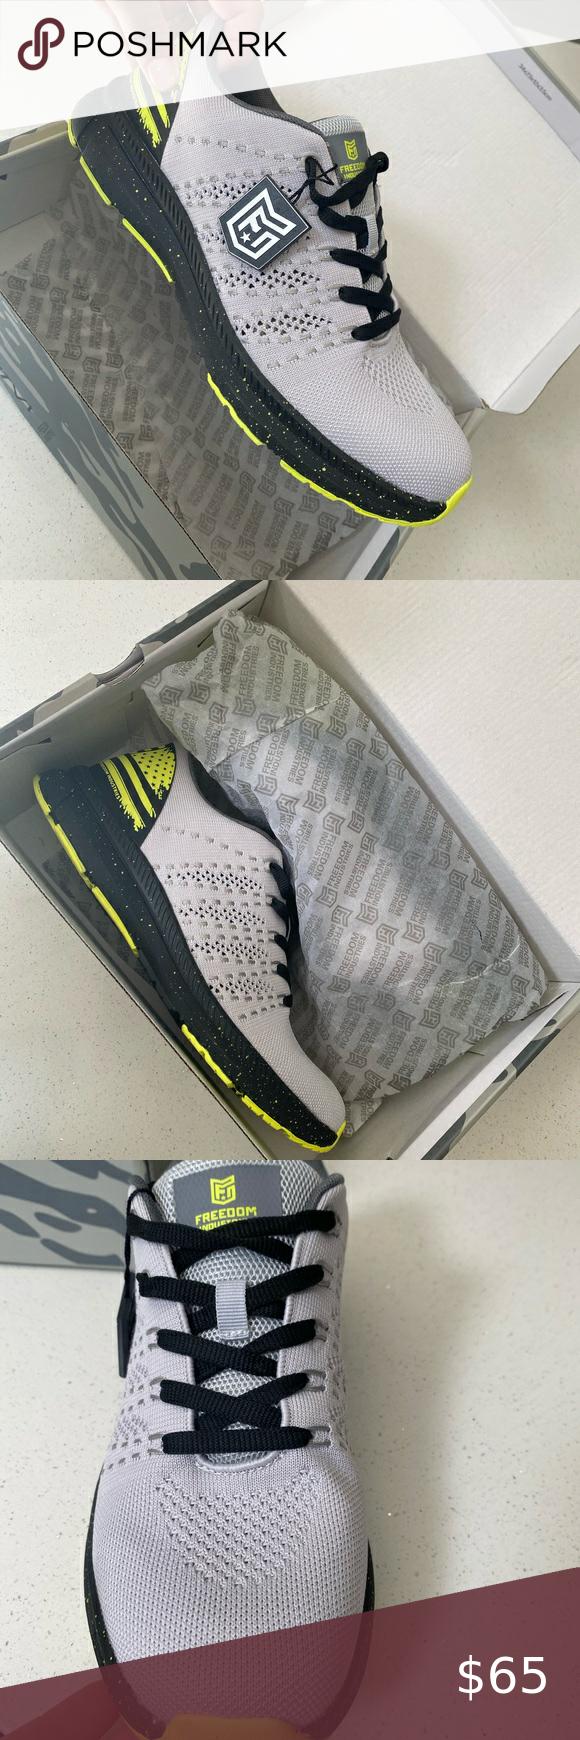 Men S Freedom Industries Tennis Shoes In 2020 Tennis Shoes Men Mens Shoes Sneakers